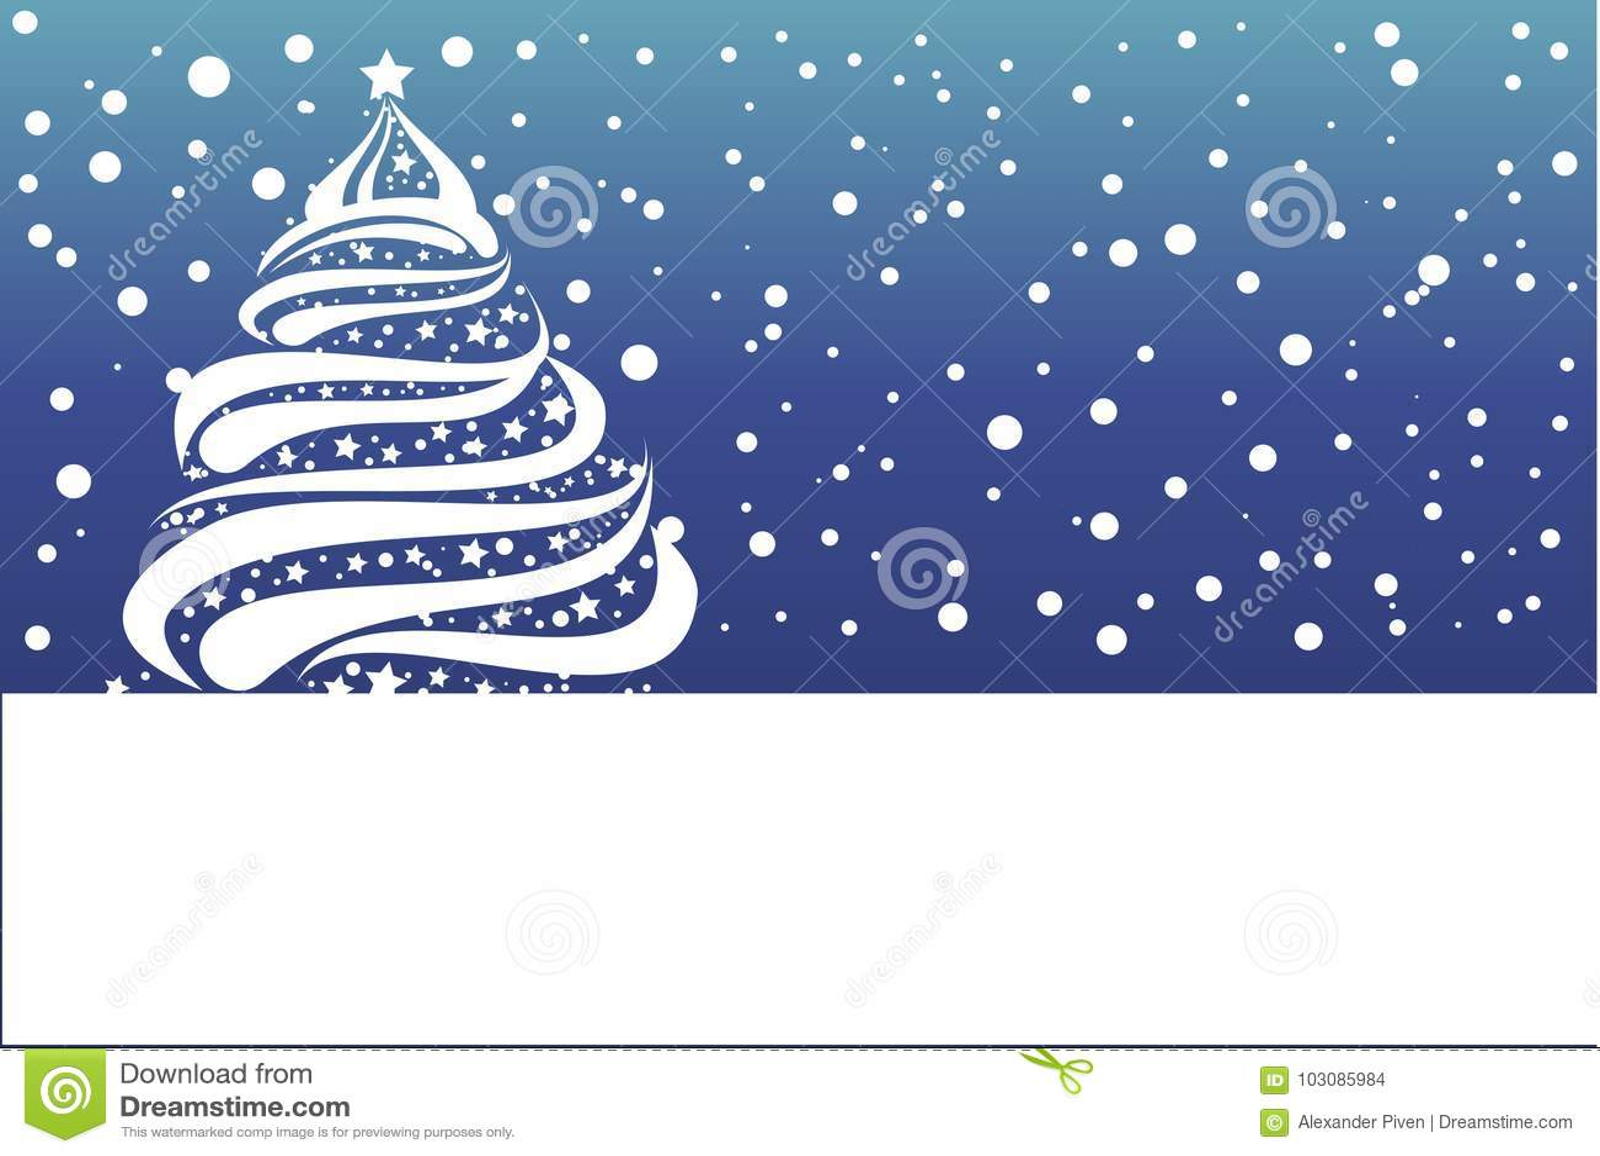 Christmas Card Gift Card With White Snowflake Christmas Tree Stock